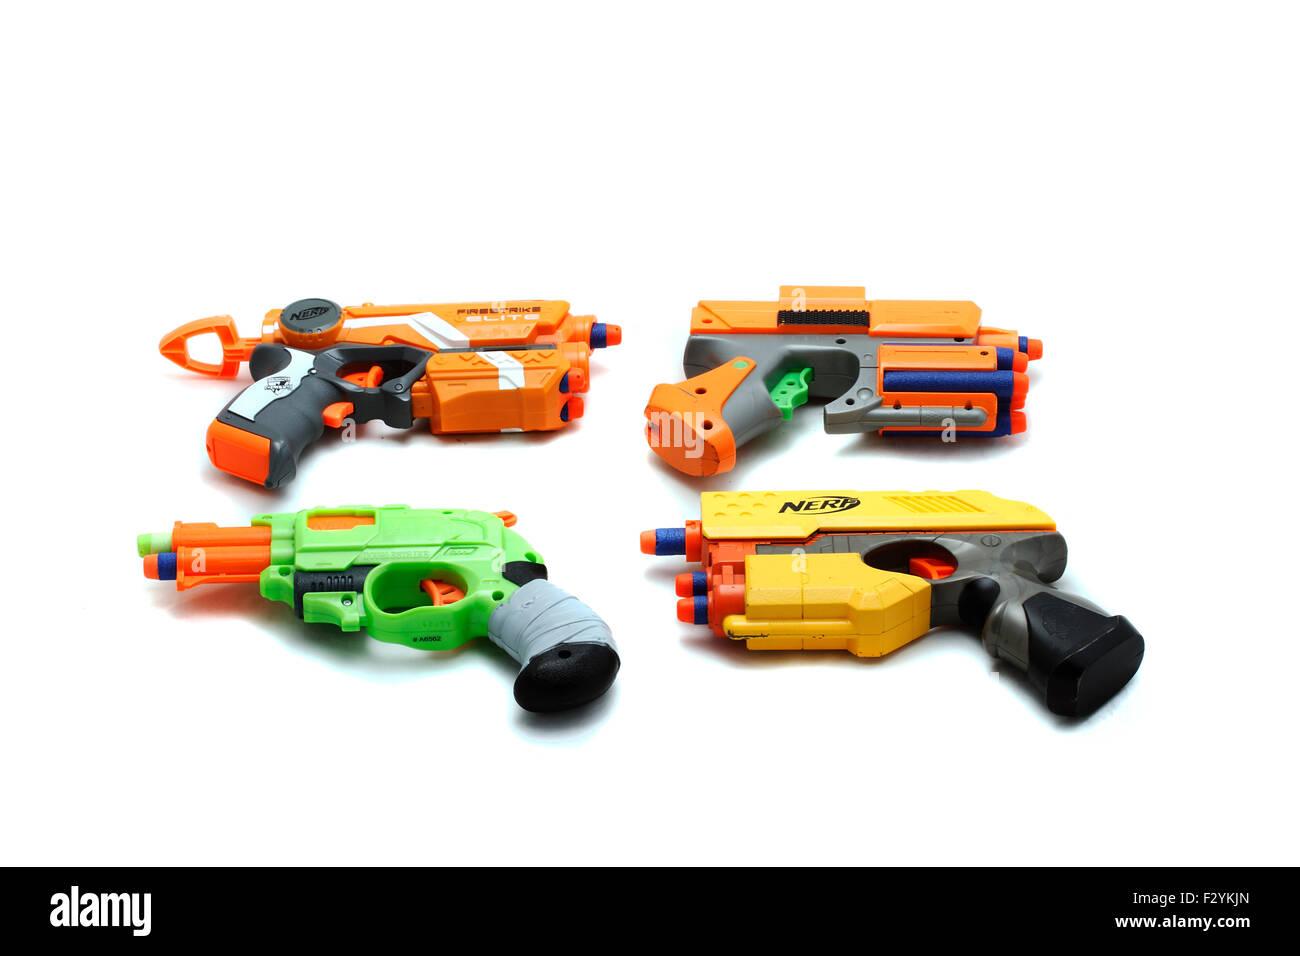 Four Nerf Guns - Firestrike Elite XD, Dark Tag StrikeFire, Nerf Zombie Strike Double strike, Nerf Scout A Nerf Blaster - Stock Image